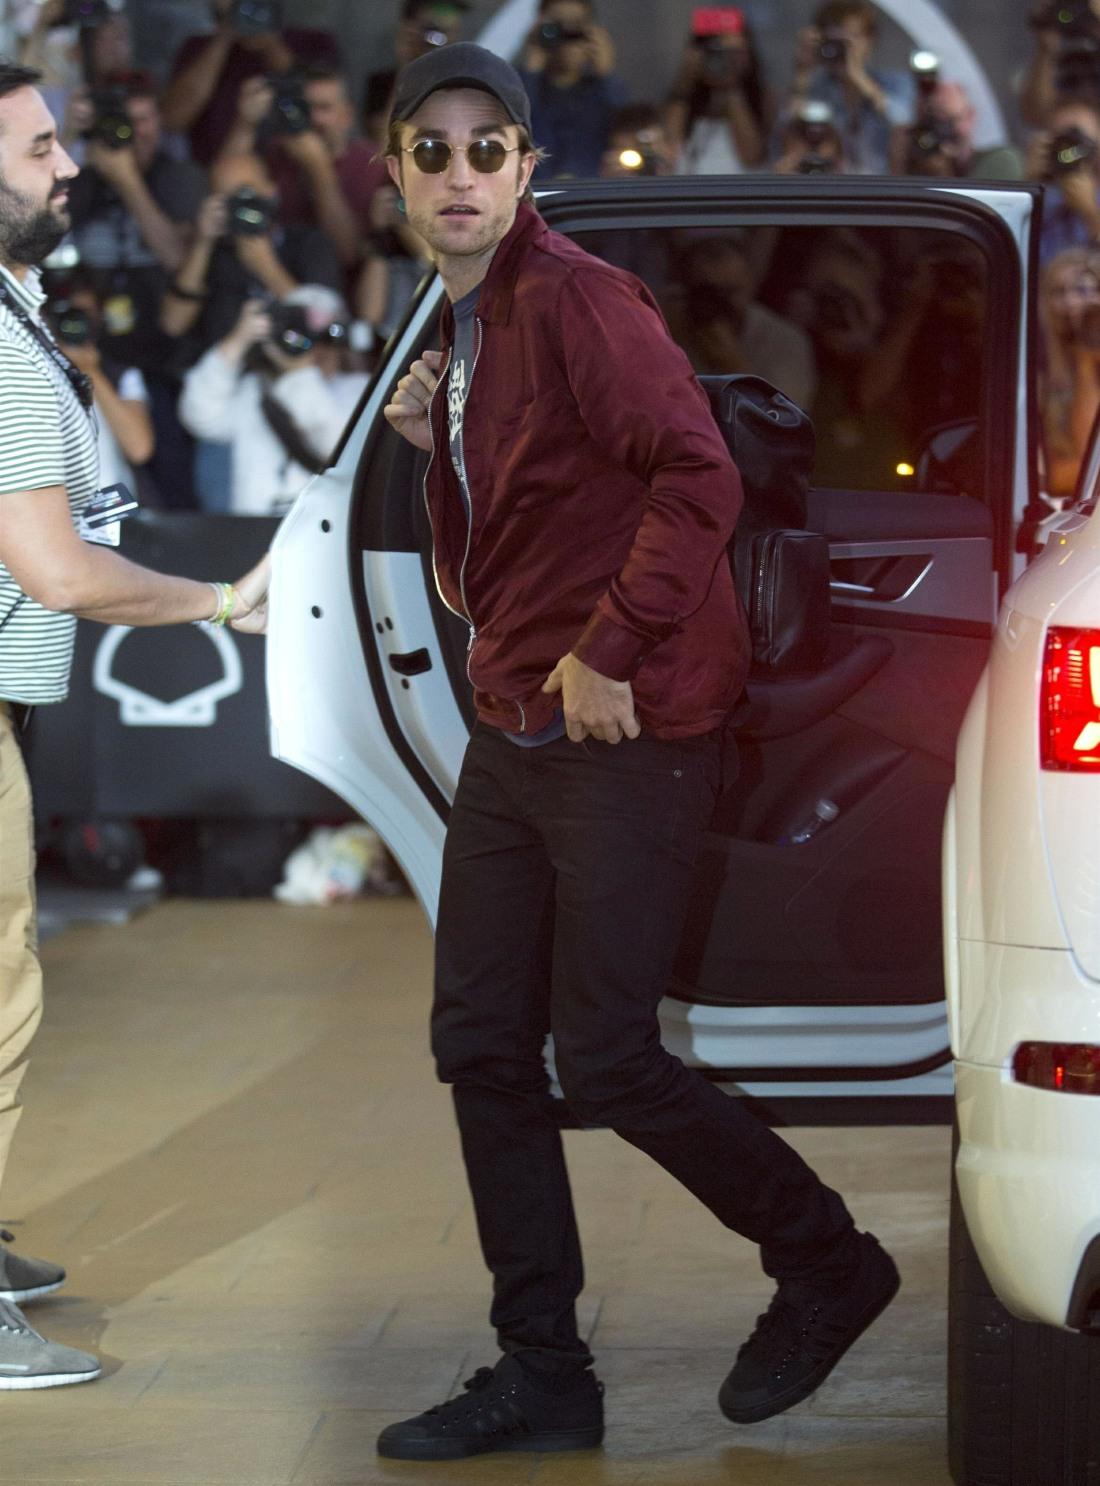 Robert Pattinson arrives during the San Sebastian Film Festival